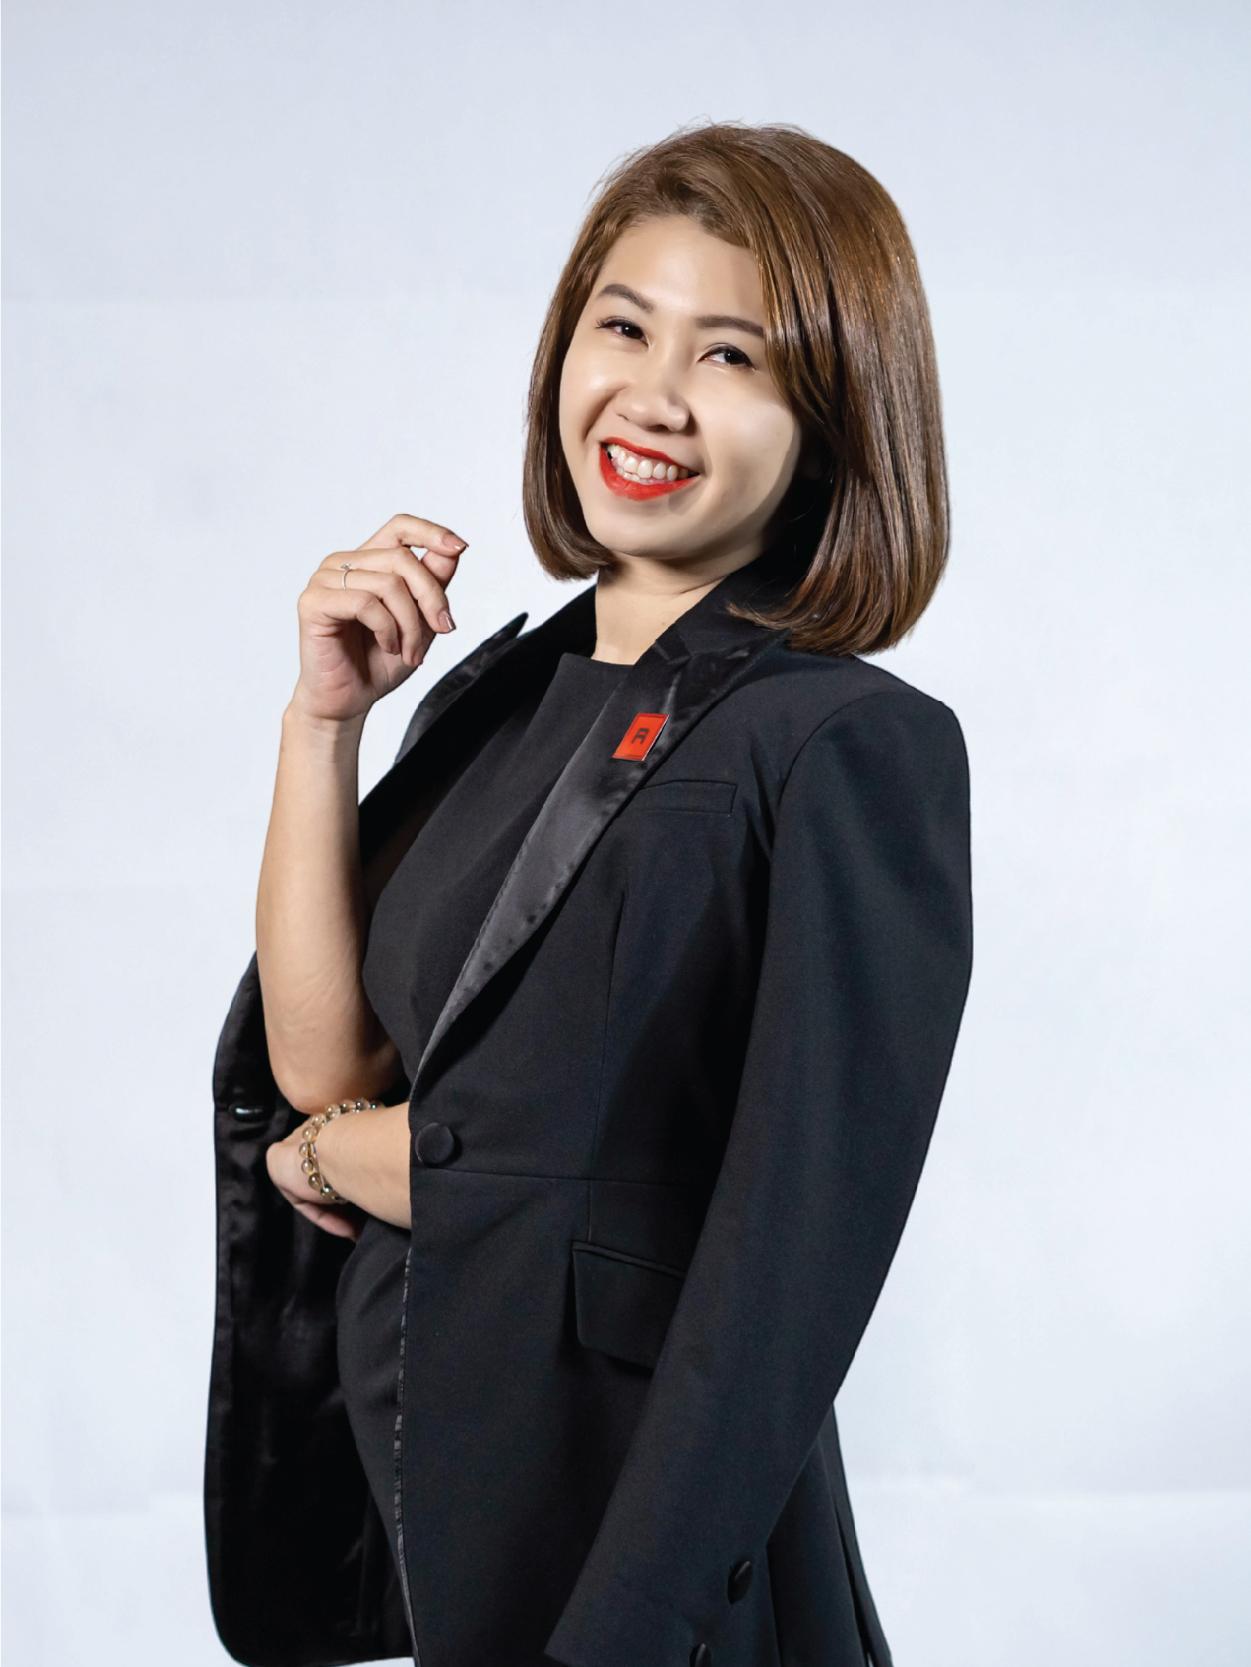 Nguyễn Ngọc Thuỳ Anh